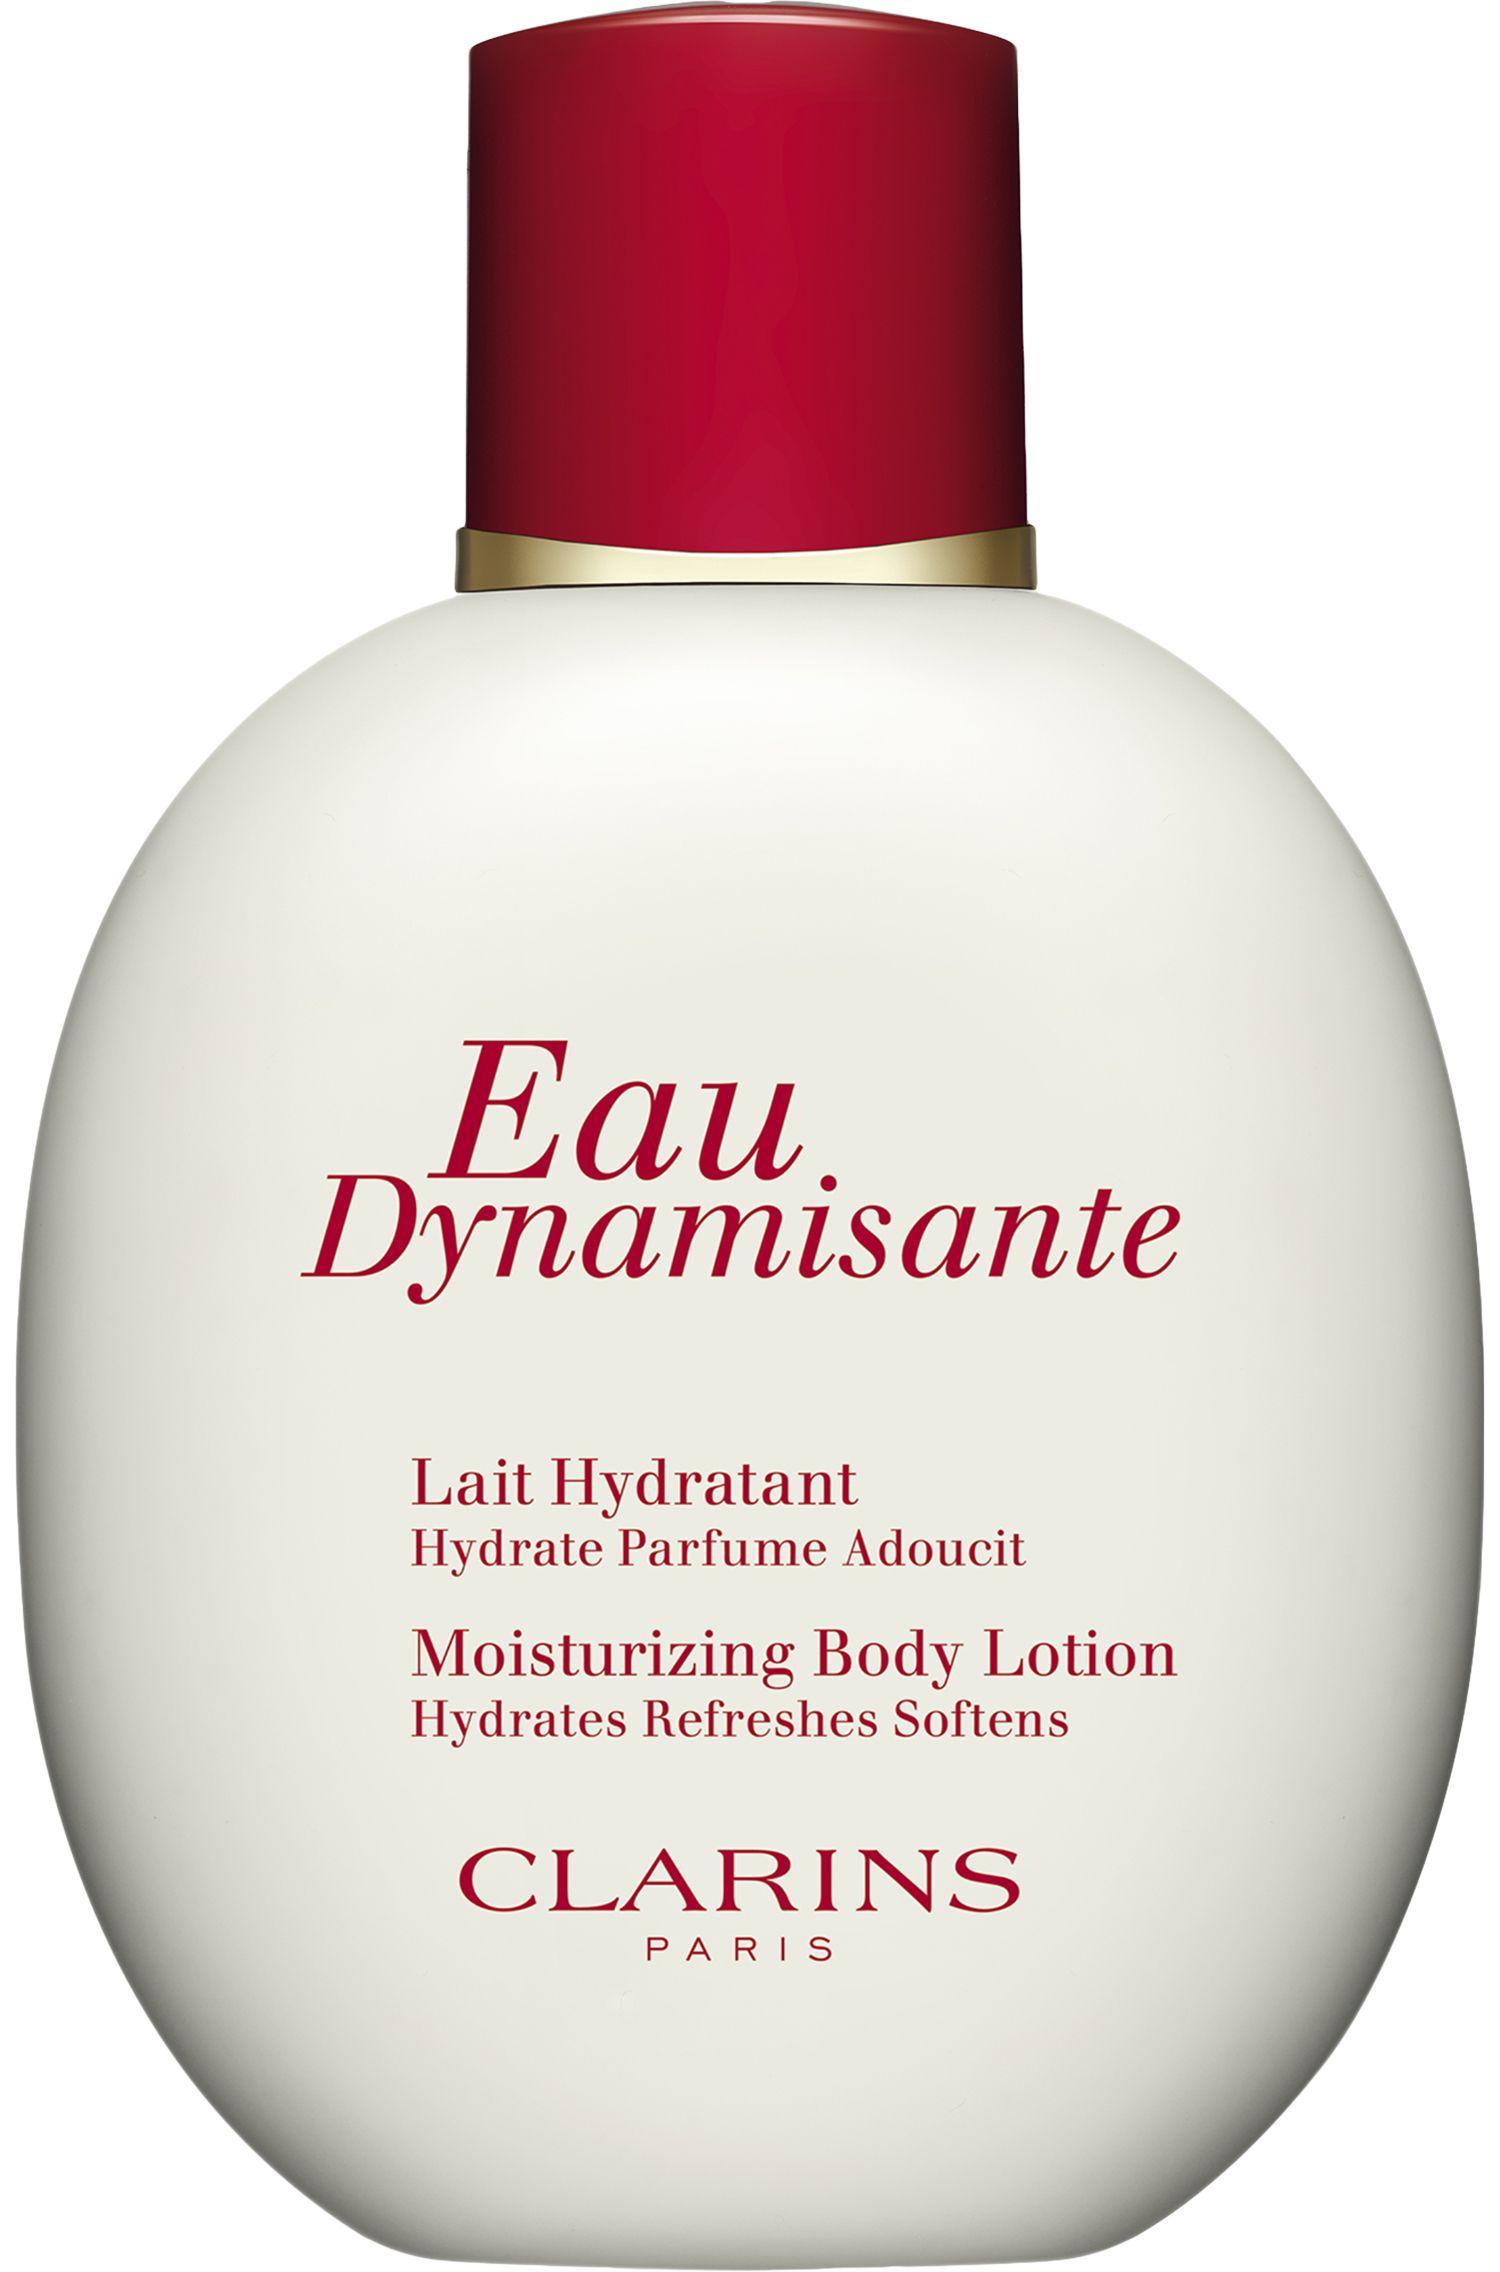 Blissim : Clarins - Lait hydratant Eau Dynamisante - Lait hydratant Eau Dynamisante